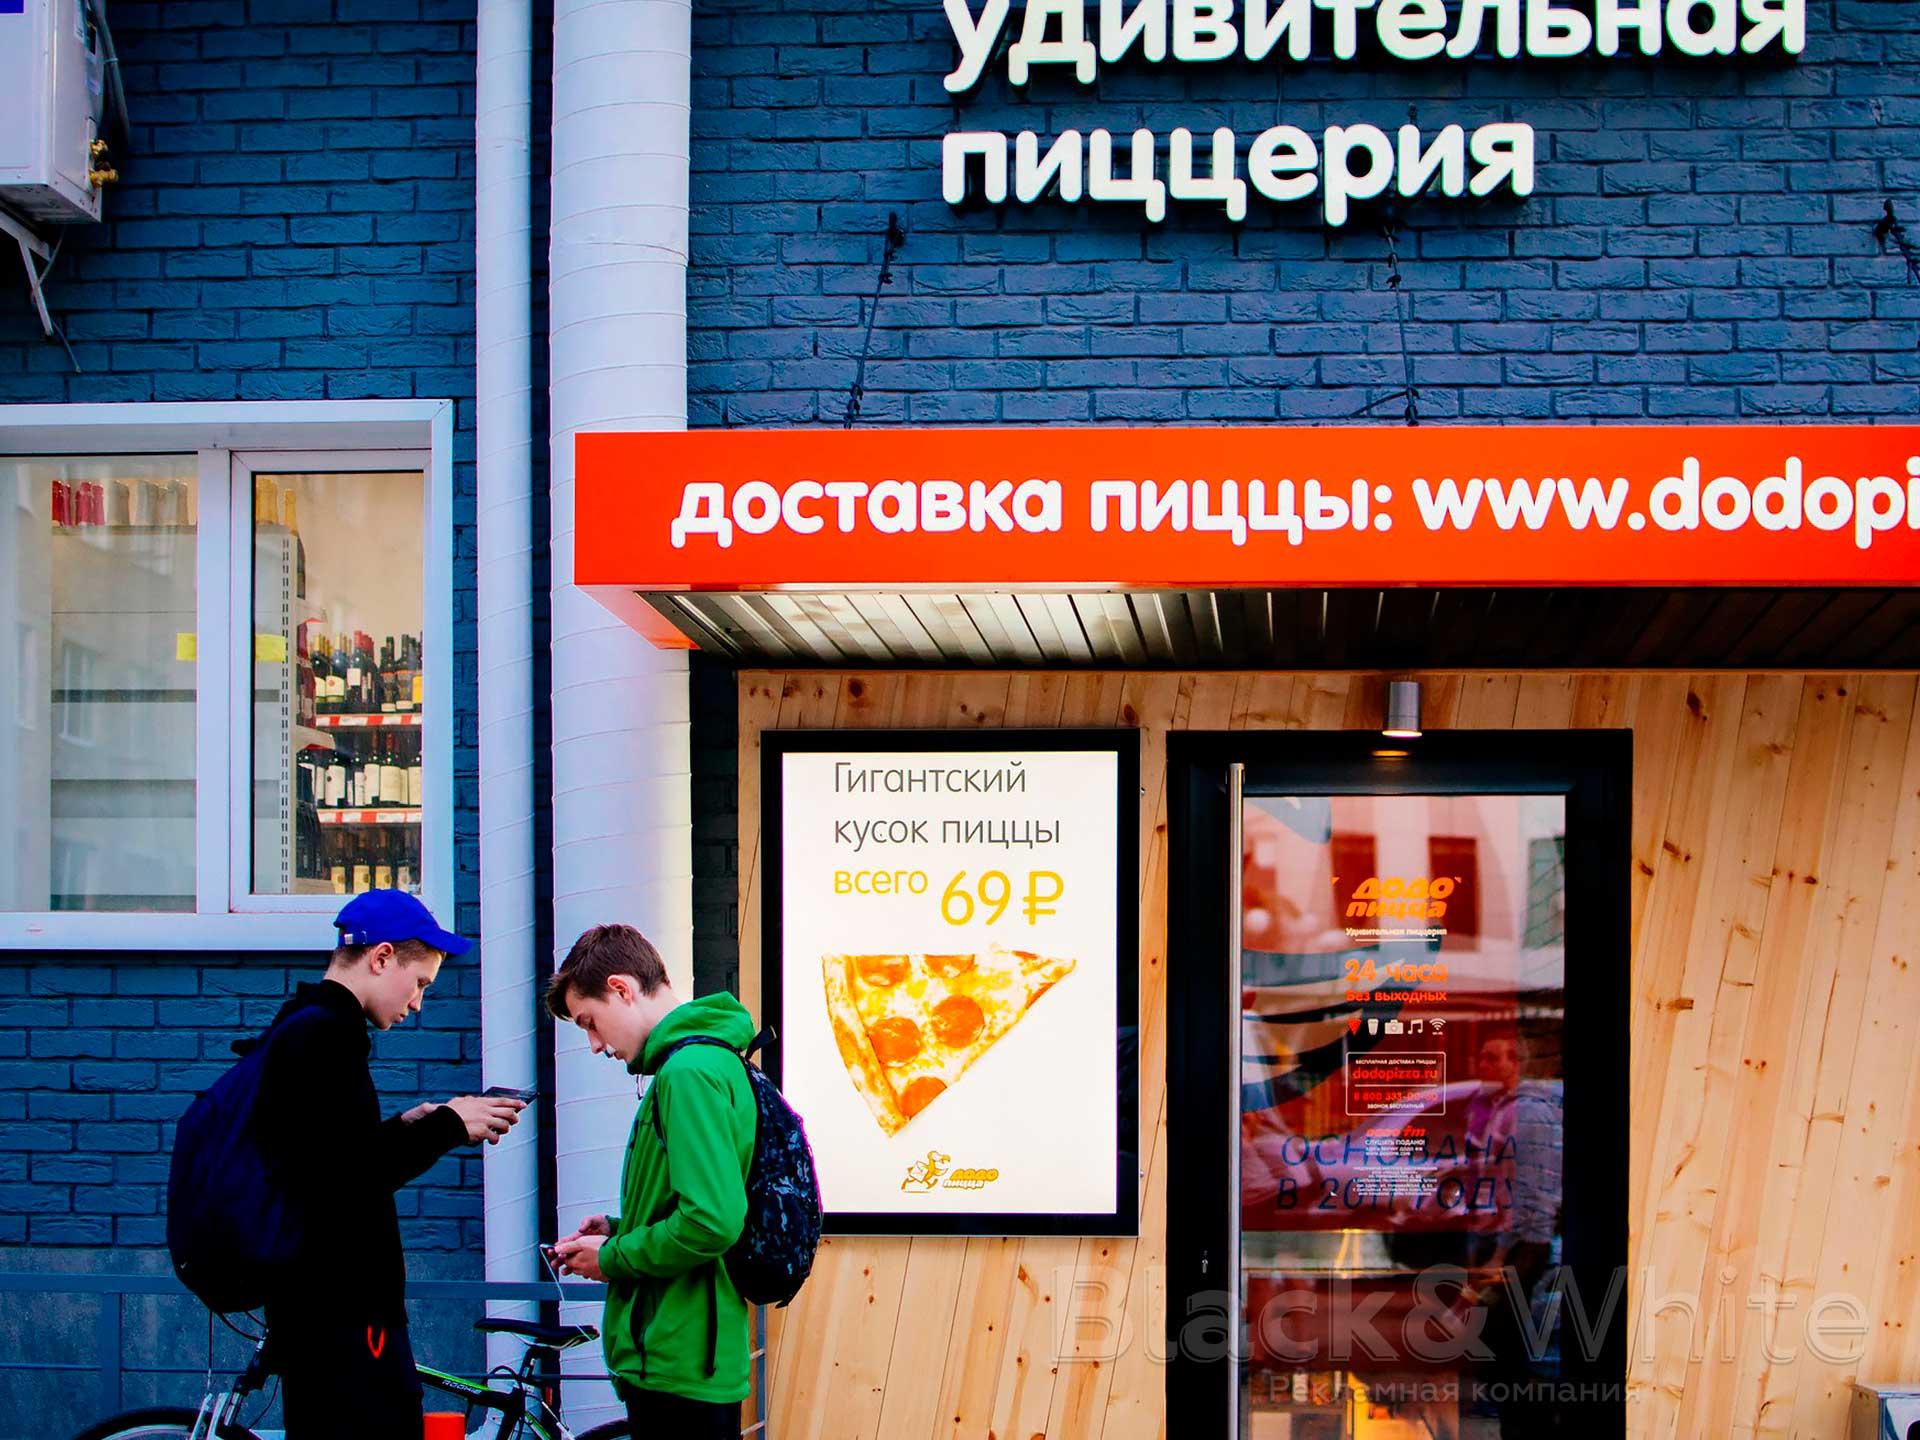 Световая-панель-Outdoor-красноярск.jpg